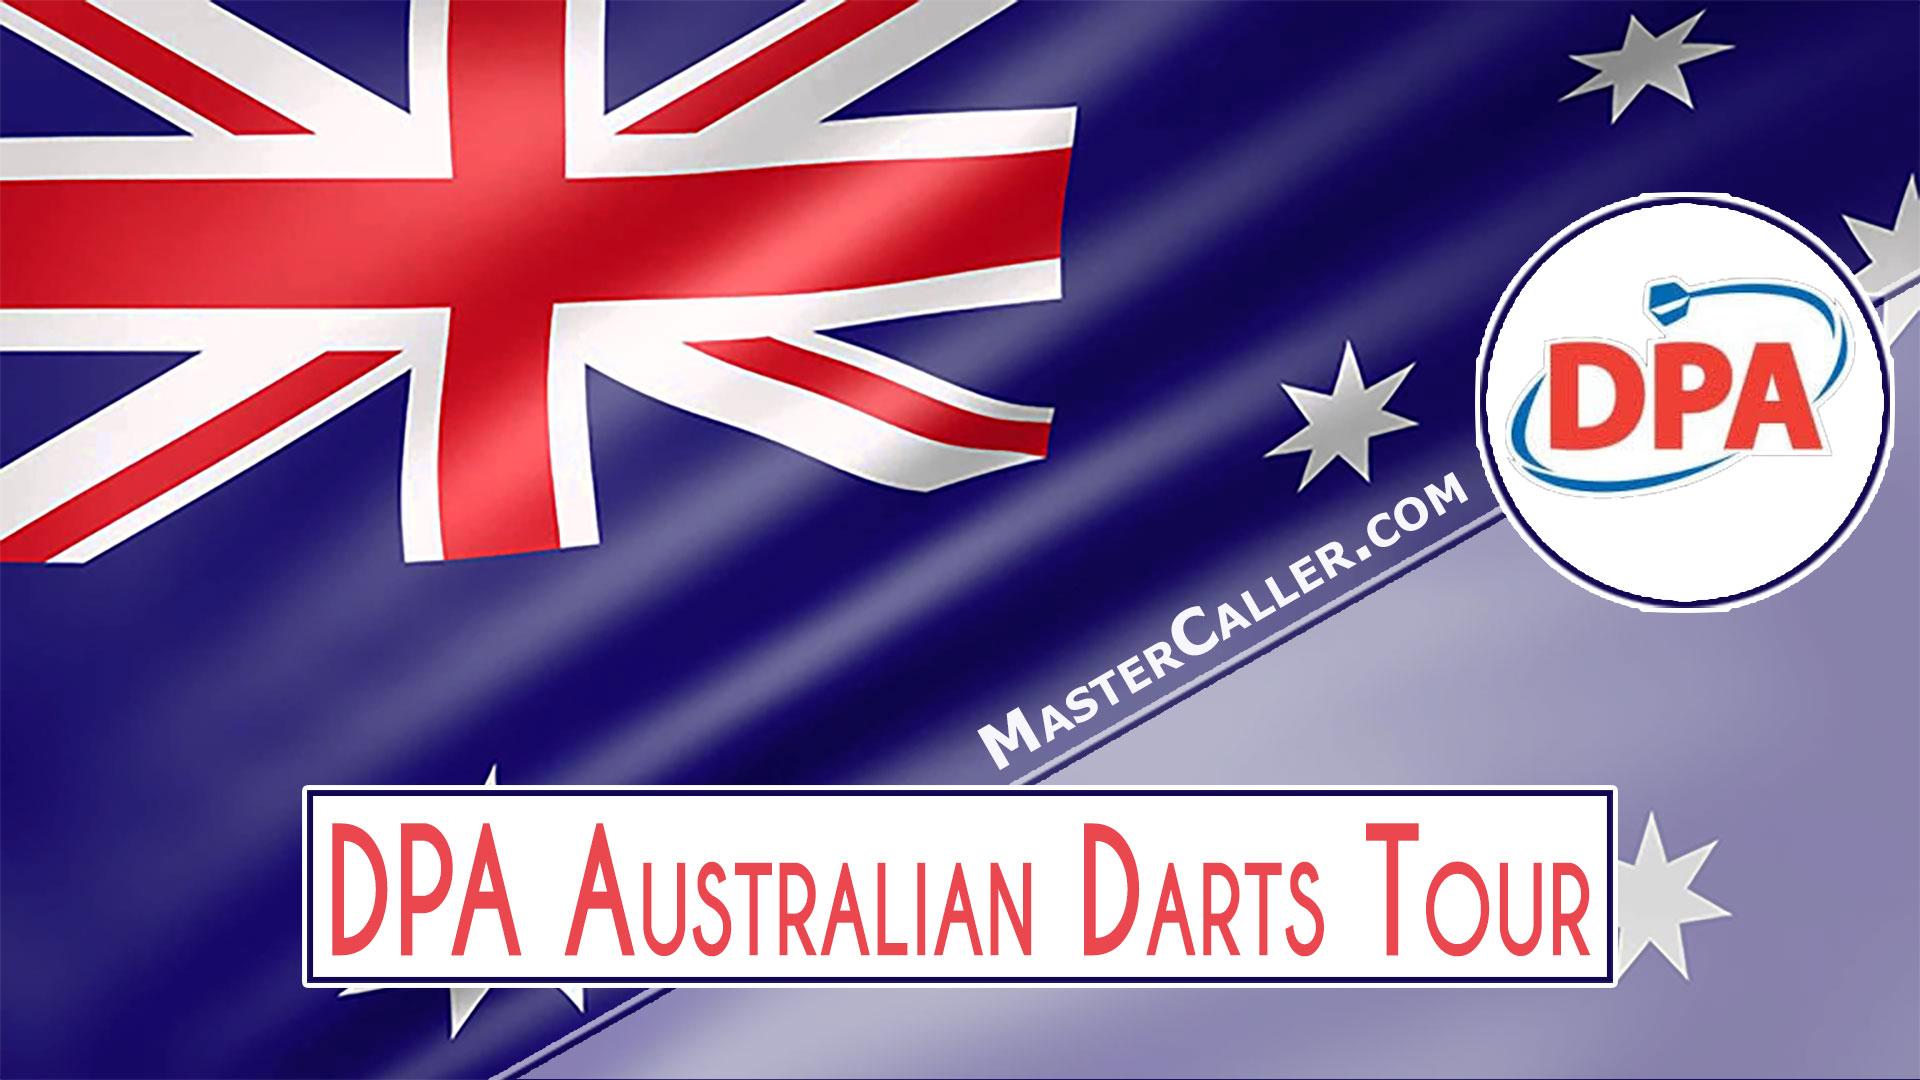 PDC Australian Tour (DPA) - 2009 DPA 01 Australian Singles Logo